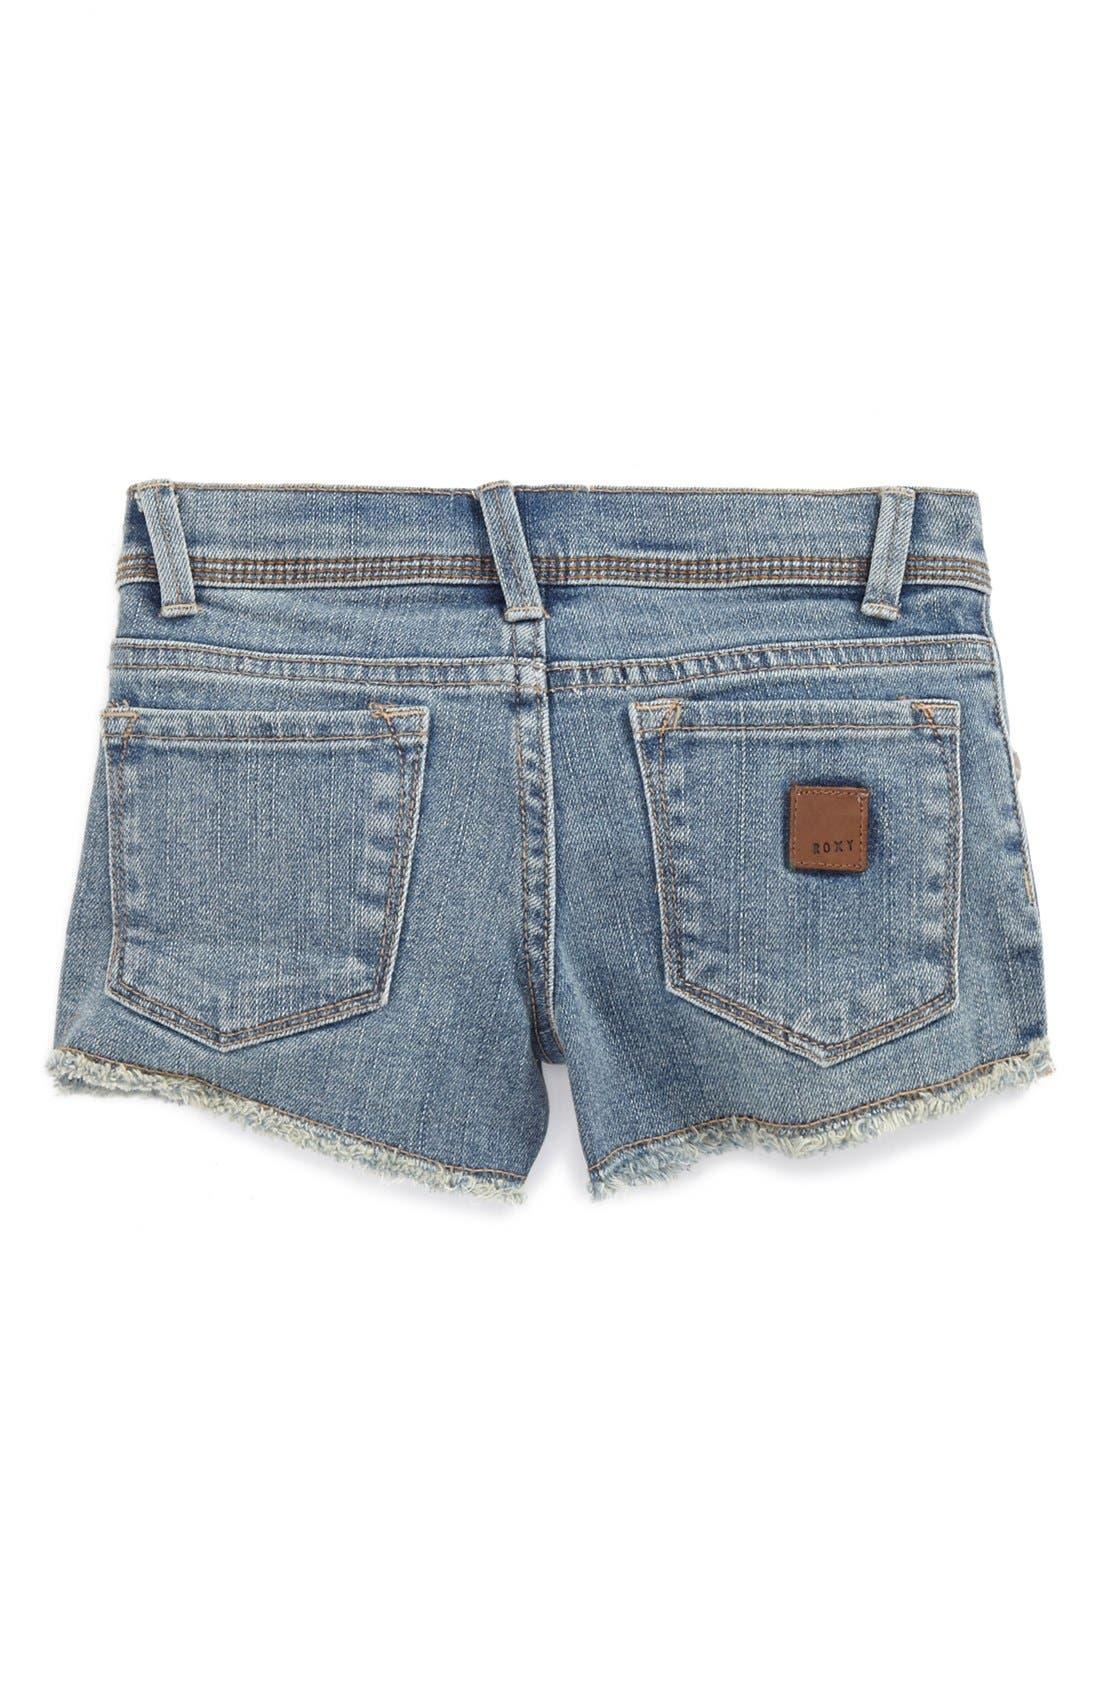 Alternate Image 1 Selected - Roxy 'Blaze' Denim Shorts (Little Girls)